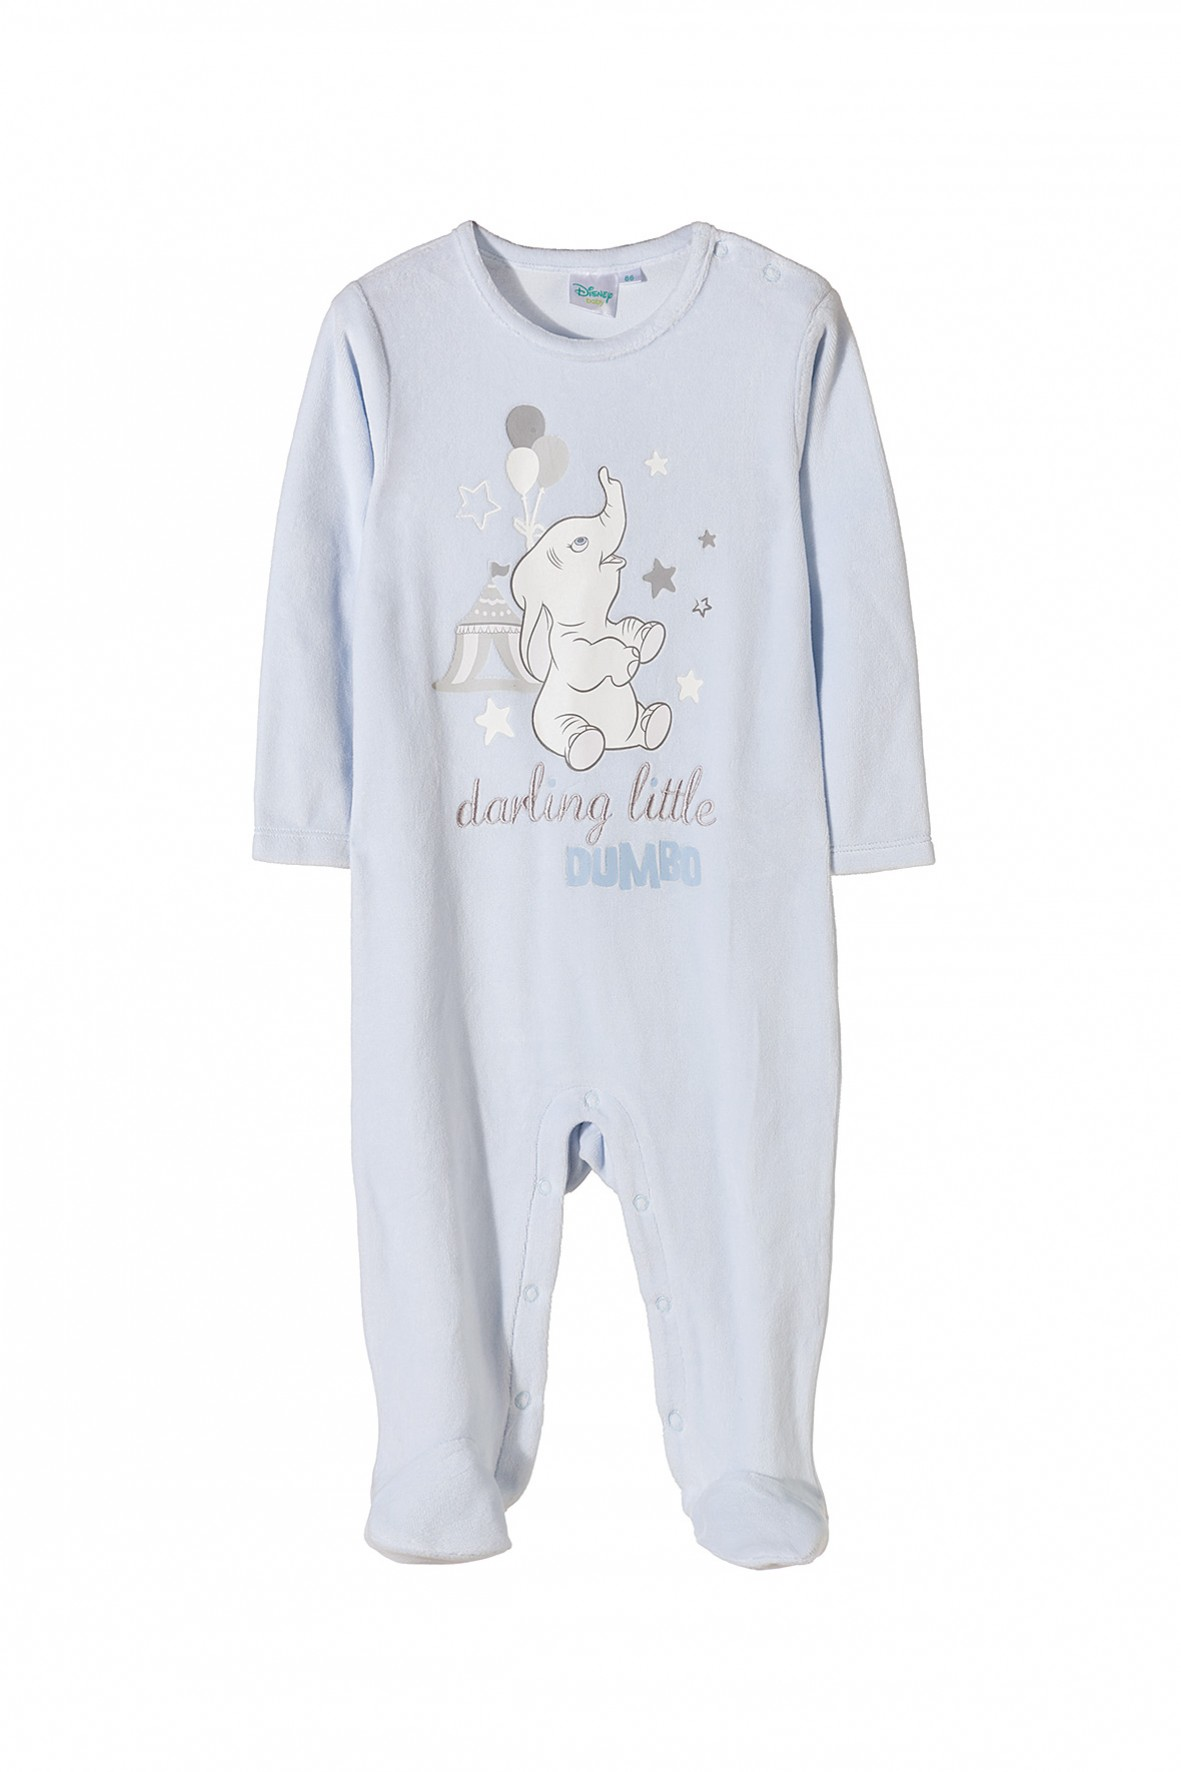 Pajac niemowlęcy Dumbo